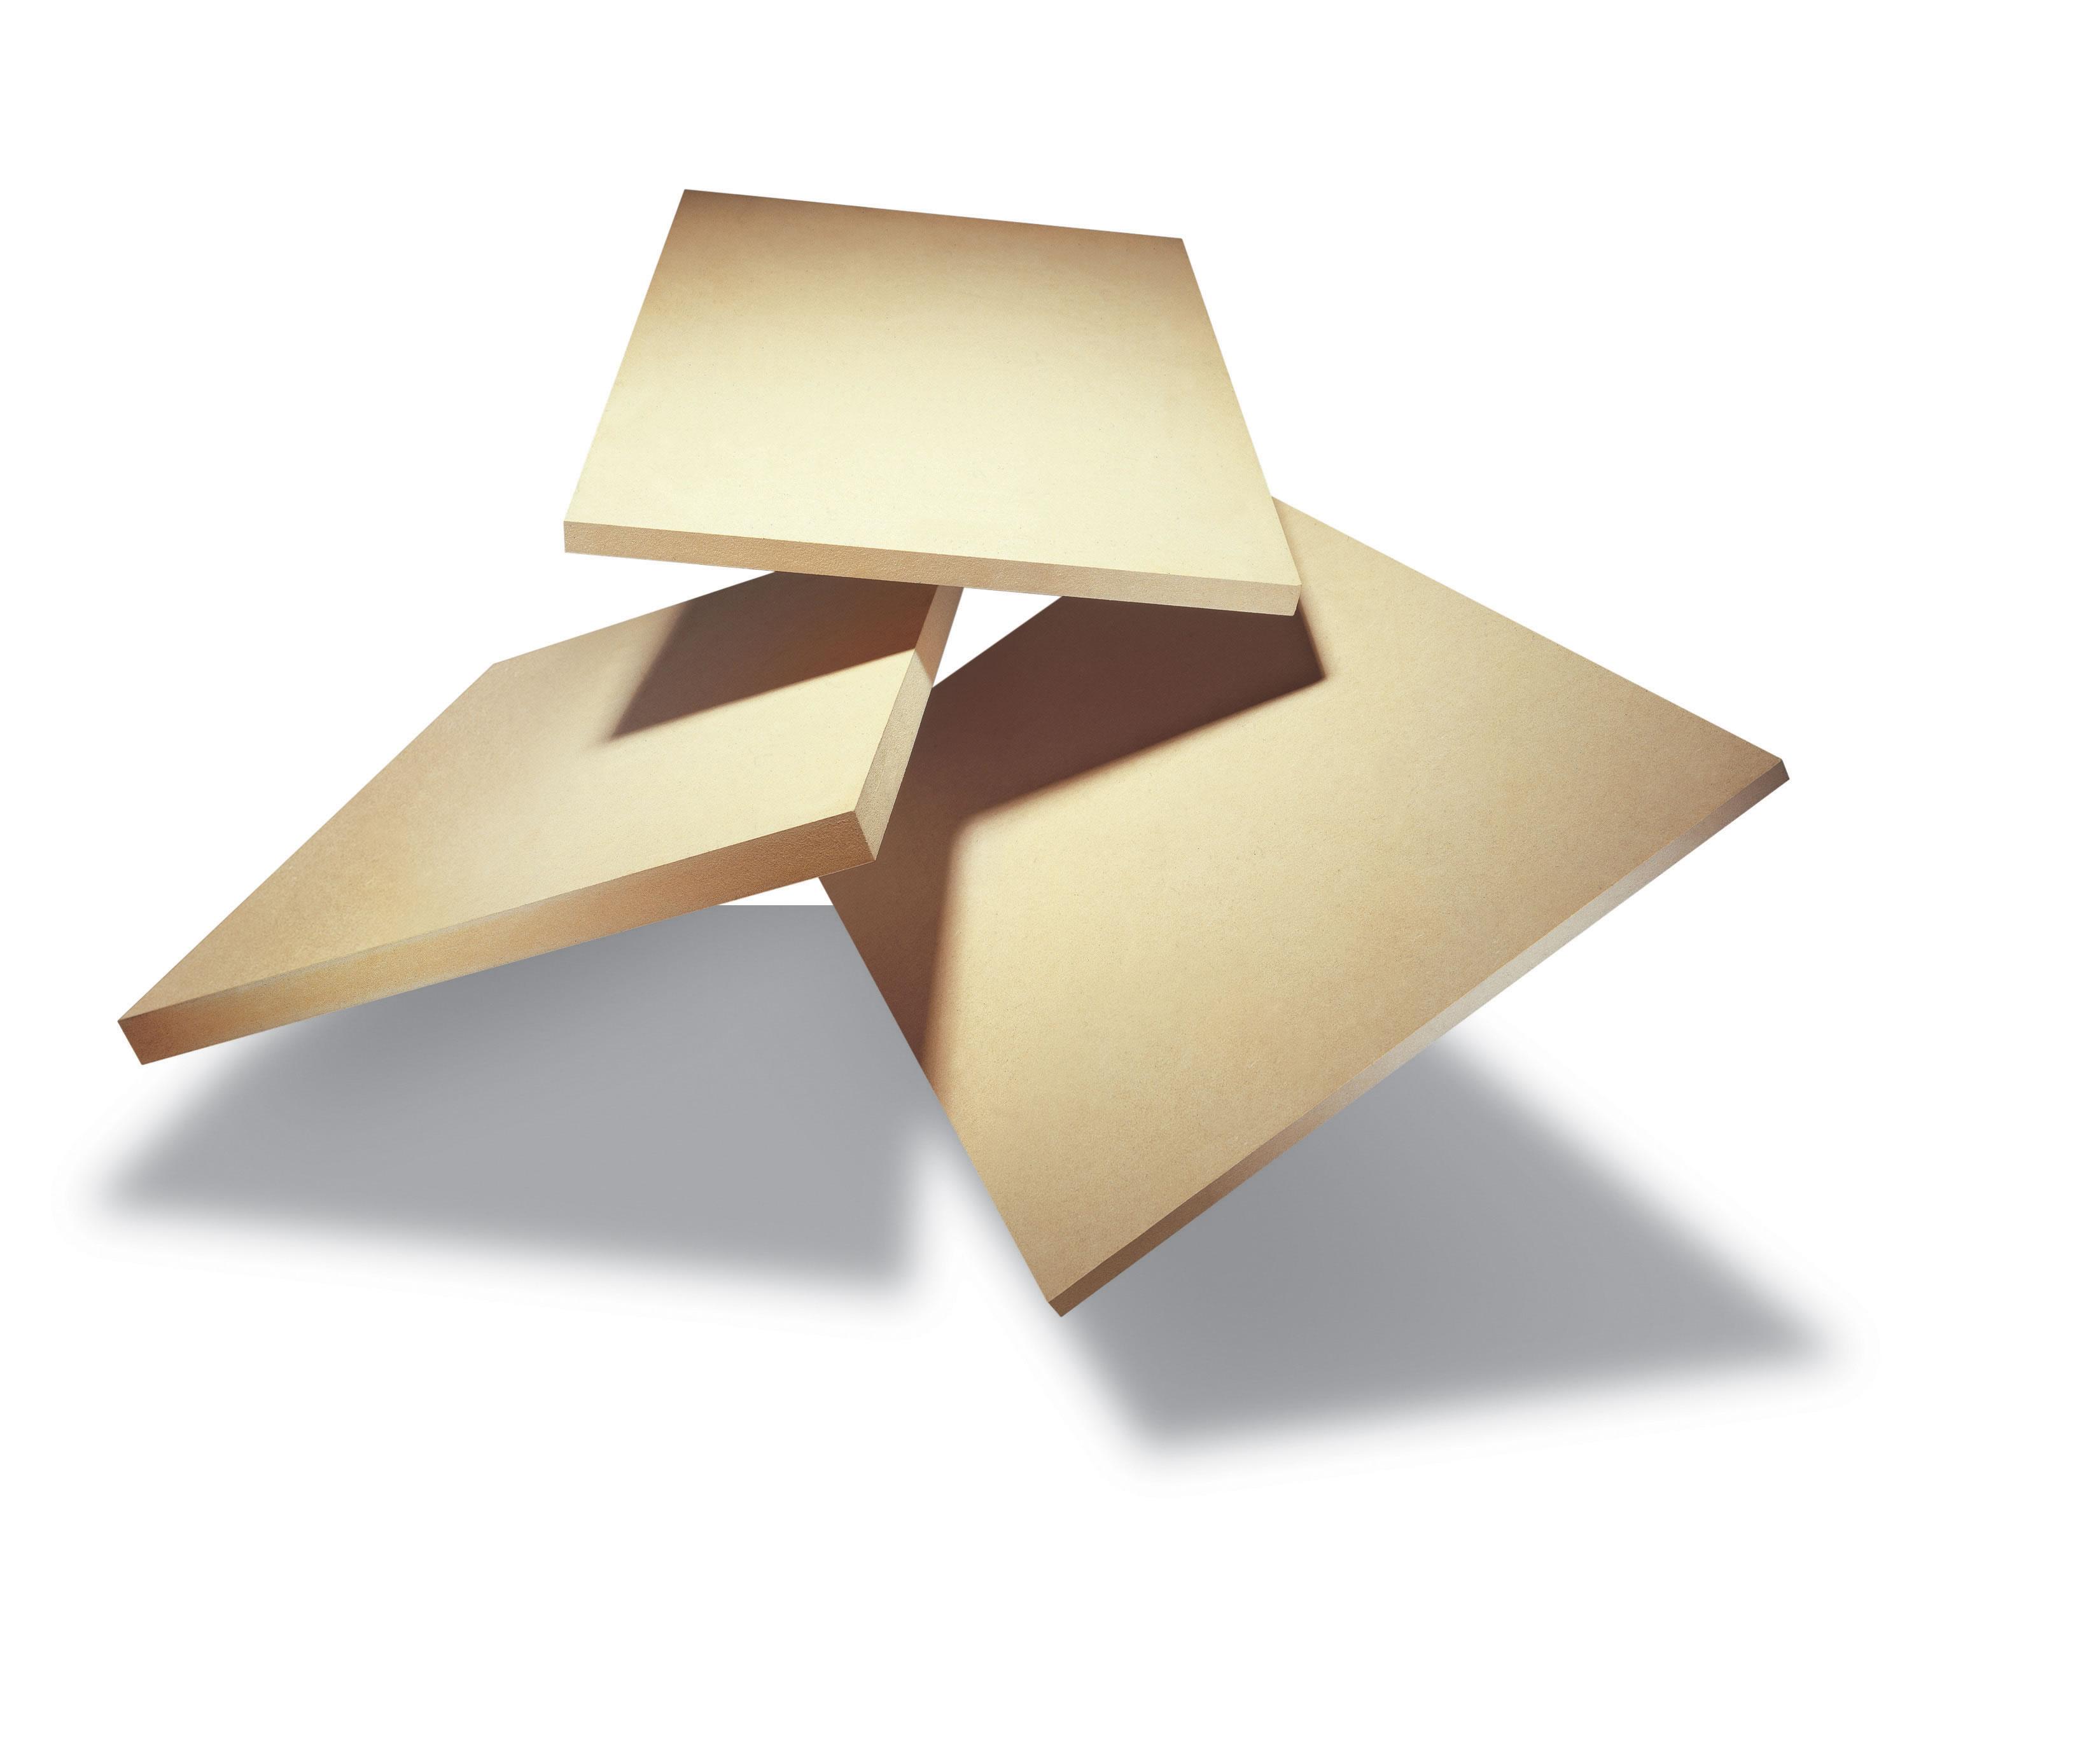 Producto fibrofacil masisa mdf 18mm corralon maderas for Catalogo de muebles de madera mdf